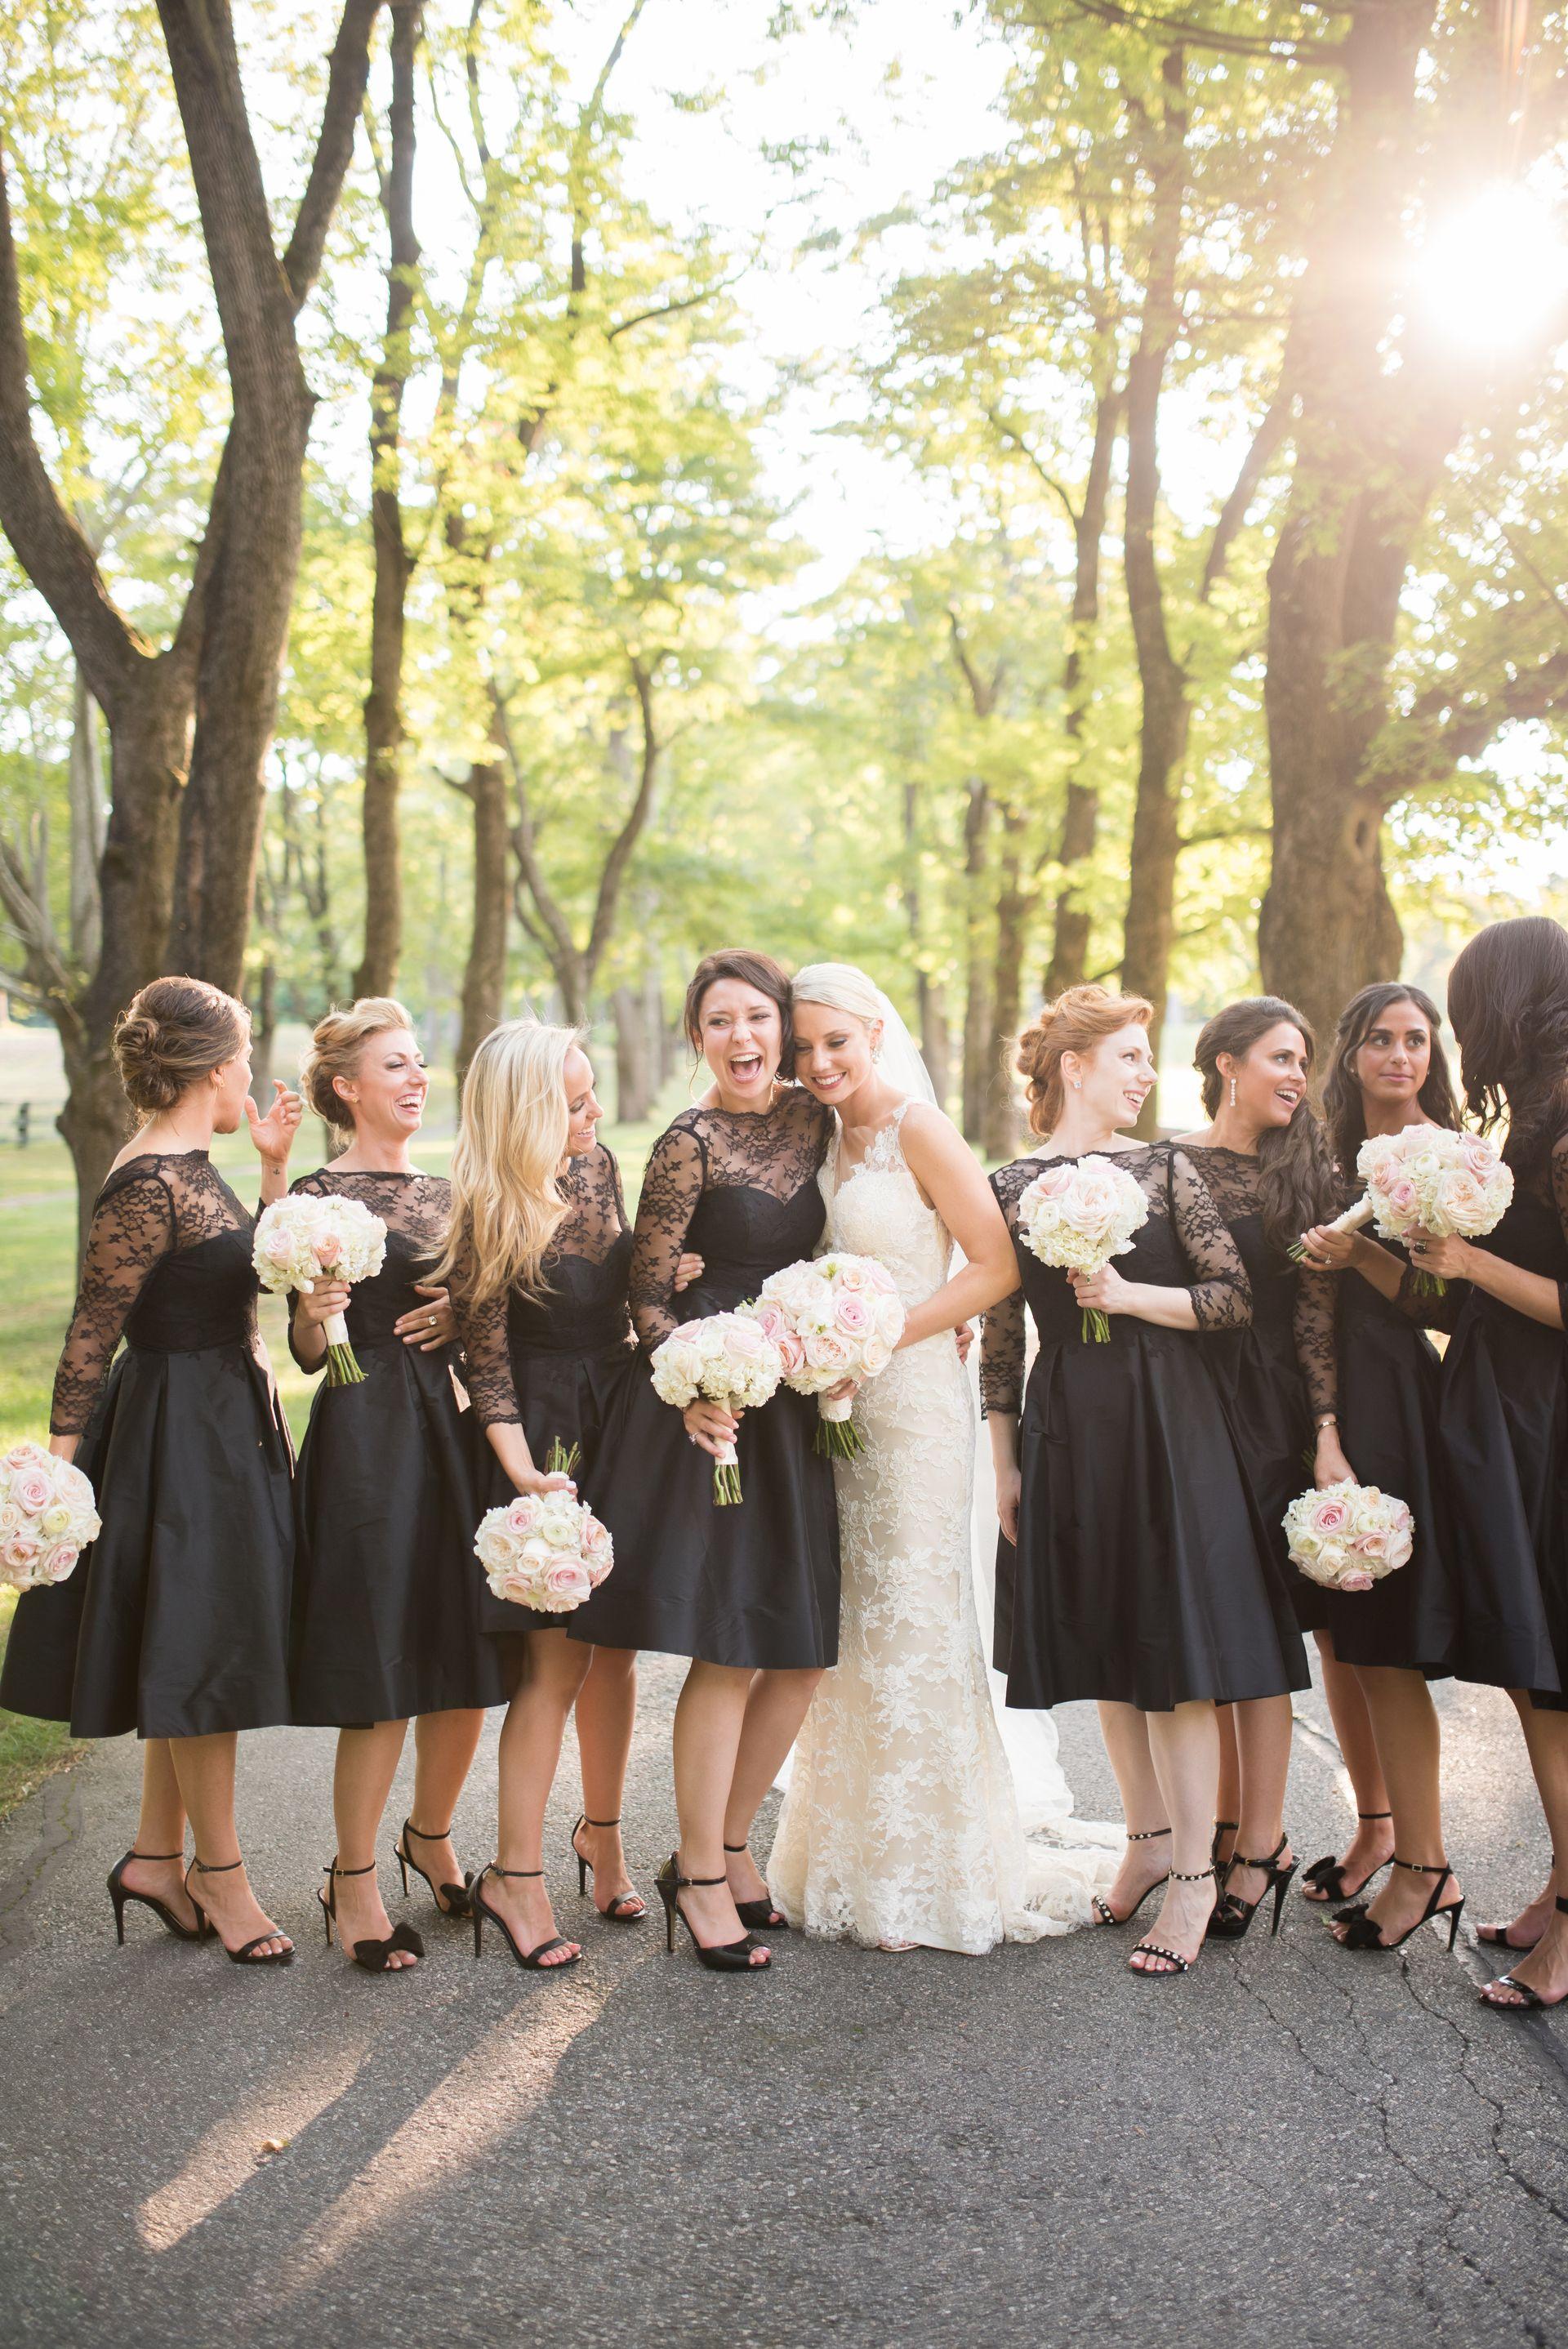 Chic Bridal Party Black Mid Length Bridesmaid Dresses Long Sleeve Lace Dr Short Black Bridesmaid Dresses Black Lace Bridesmaid Dress Black Bridesmaid Dresses